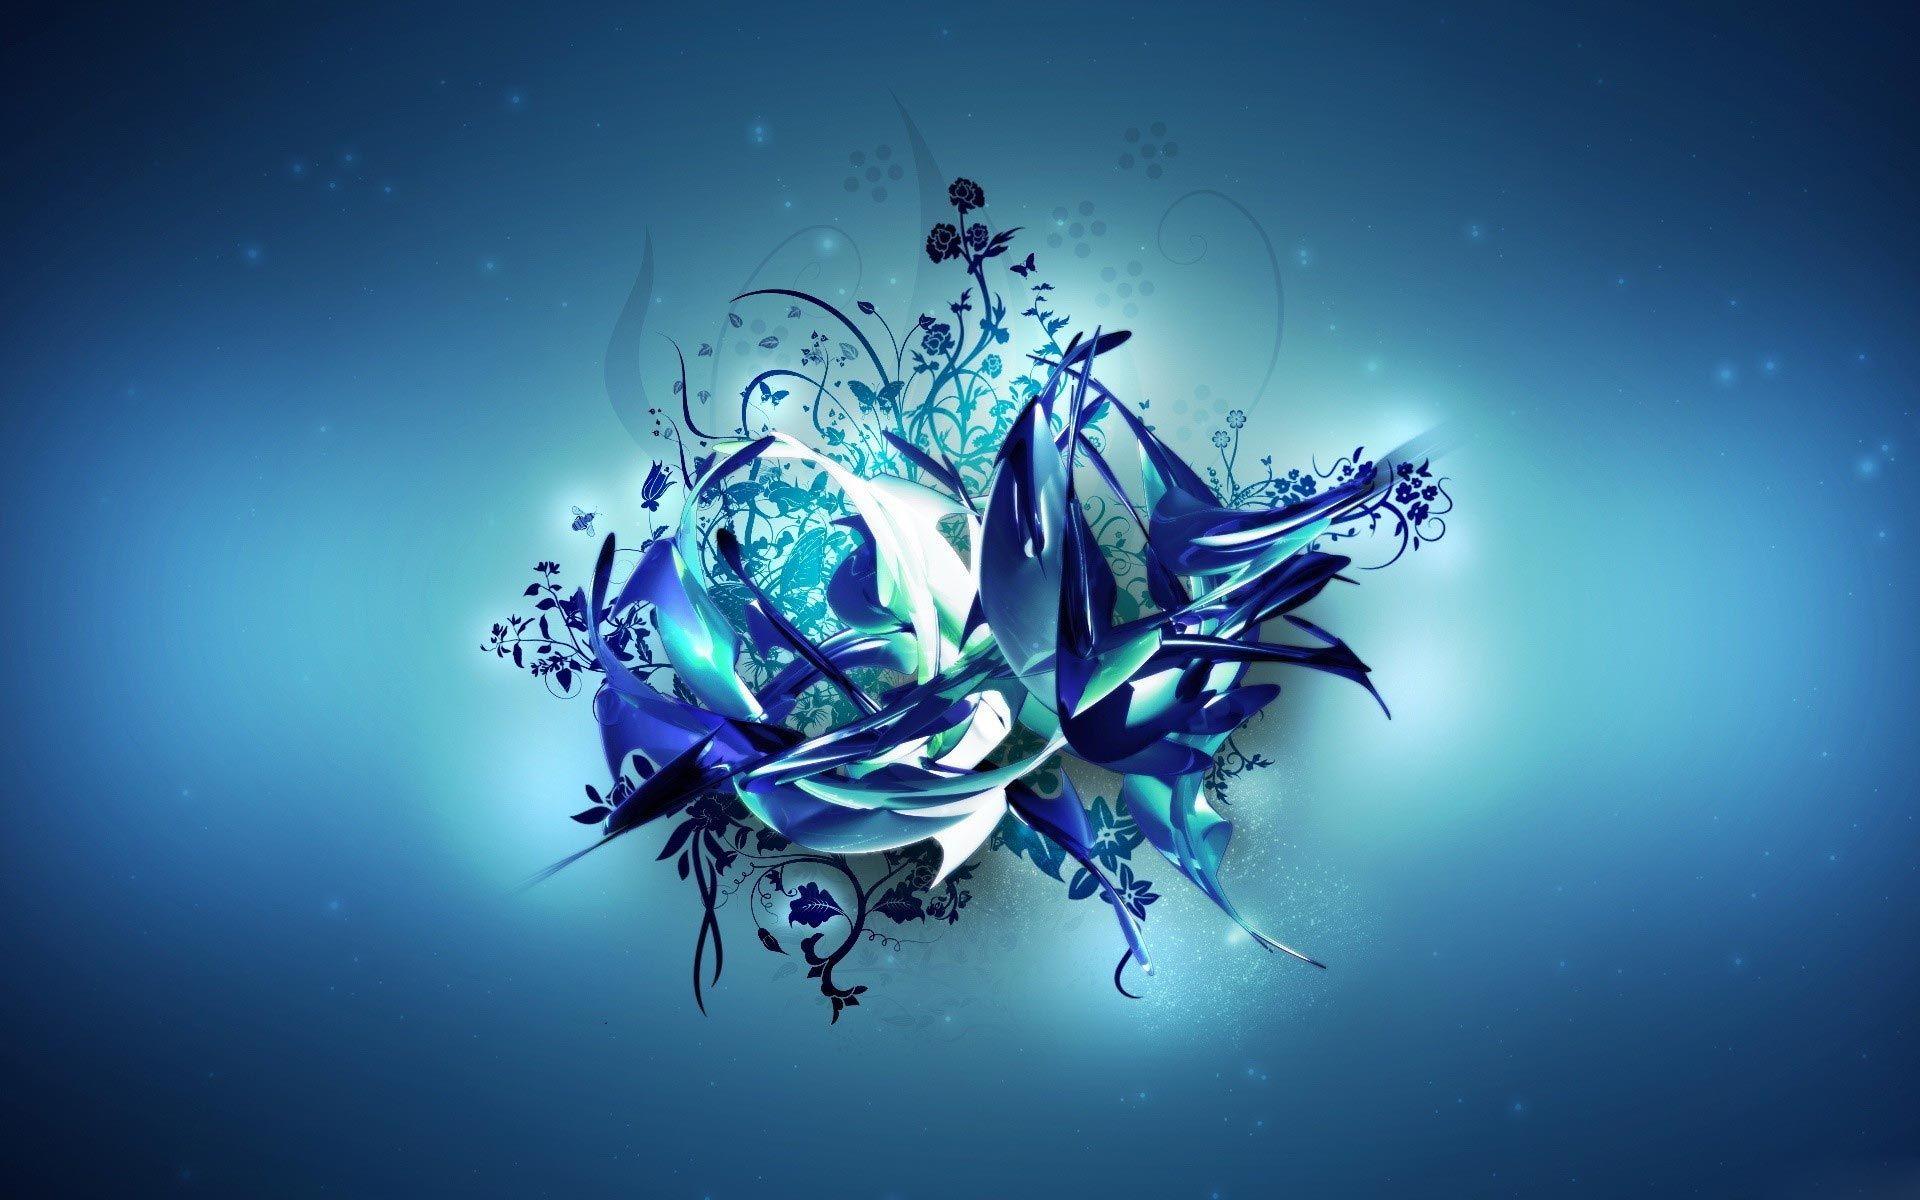 blue dragon hd wallpapers 12 #bluedragonhdwallpapers #bluedragon